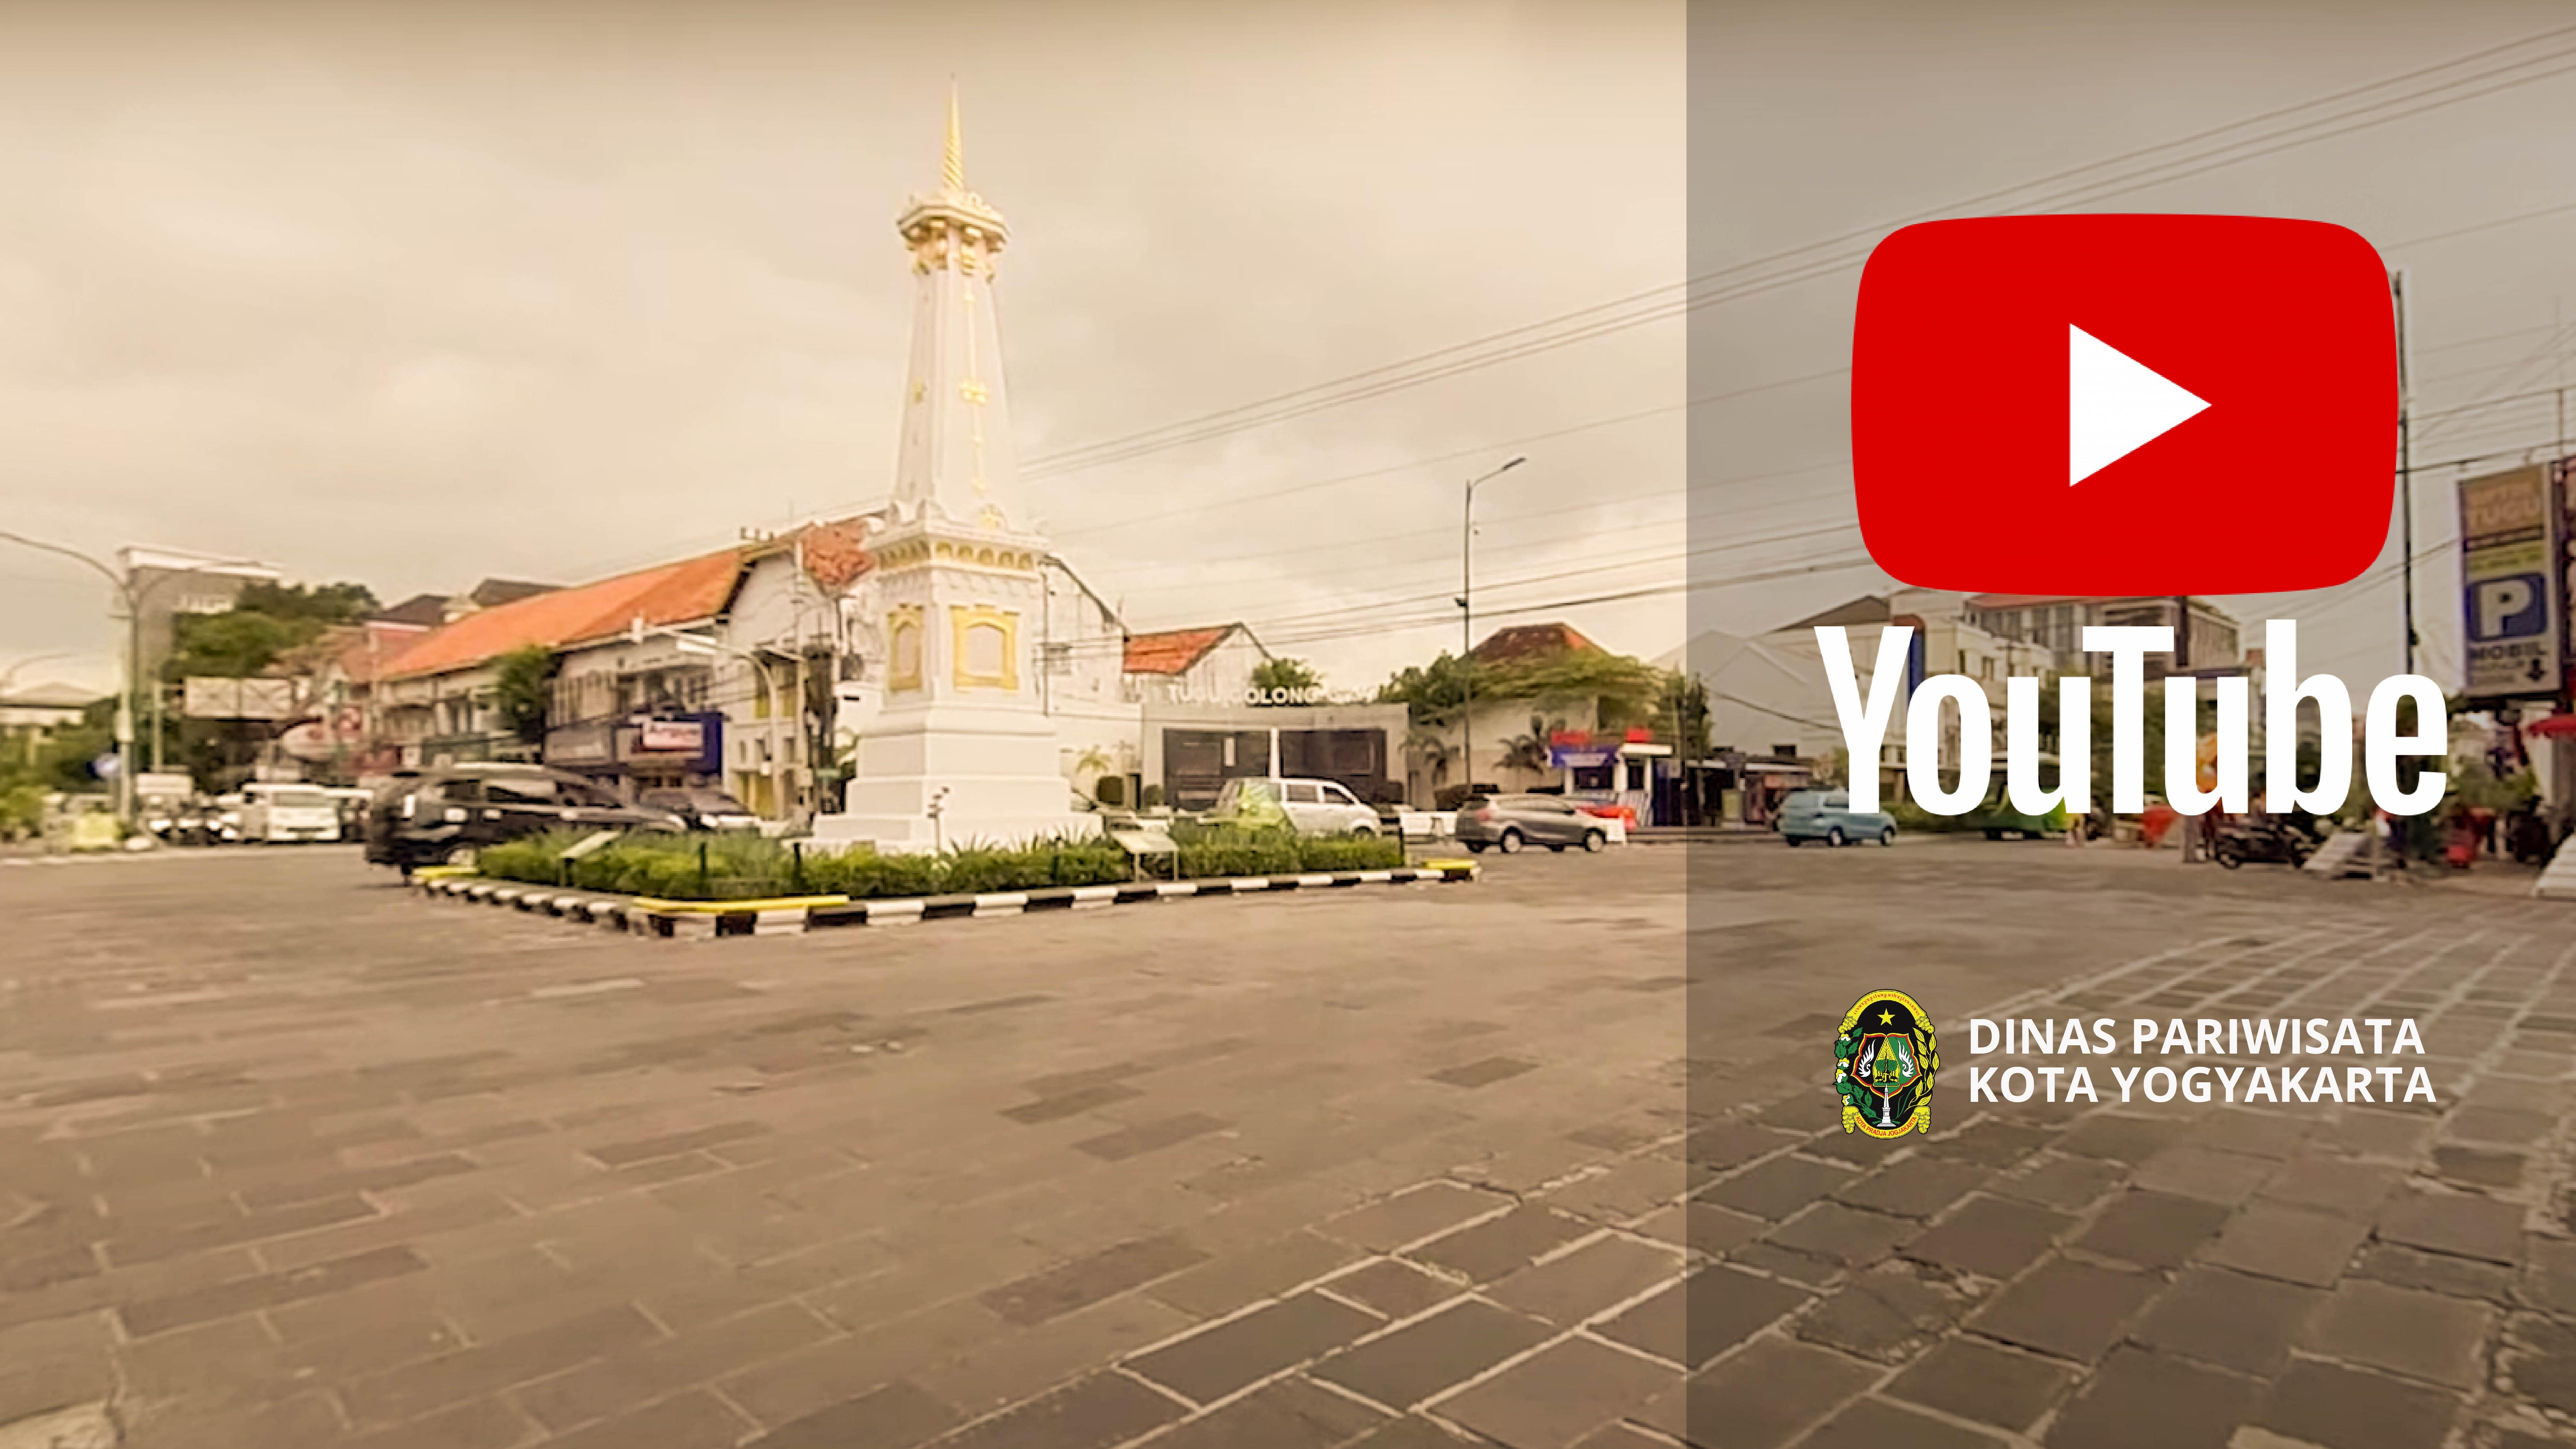 Official Youtube Dinas Pariwisata Kota Yogyakarta